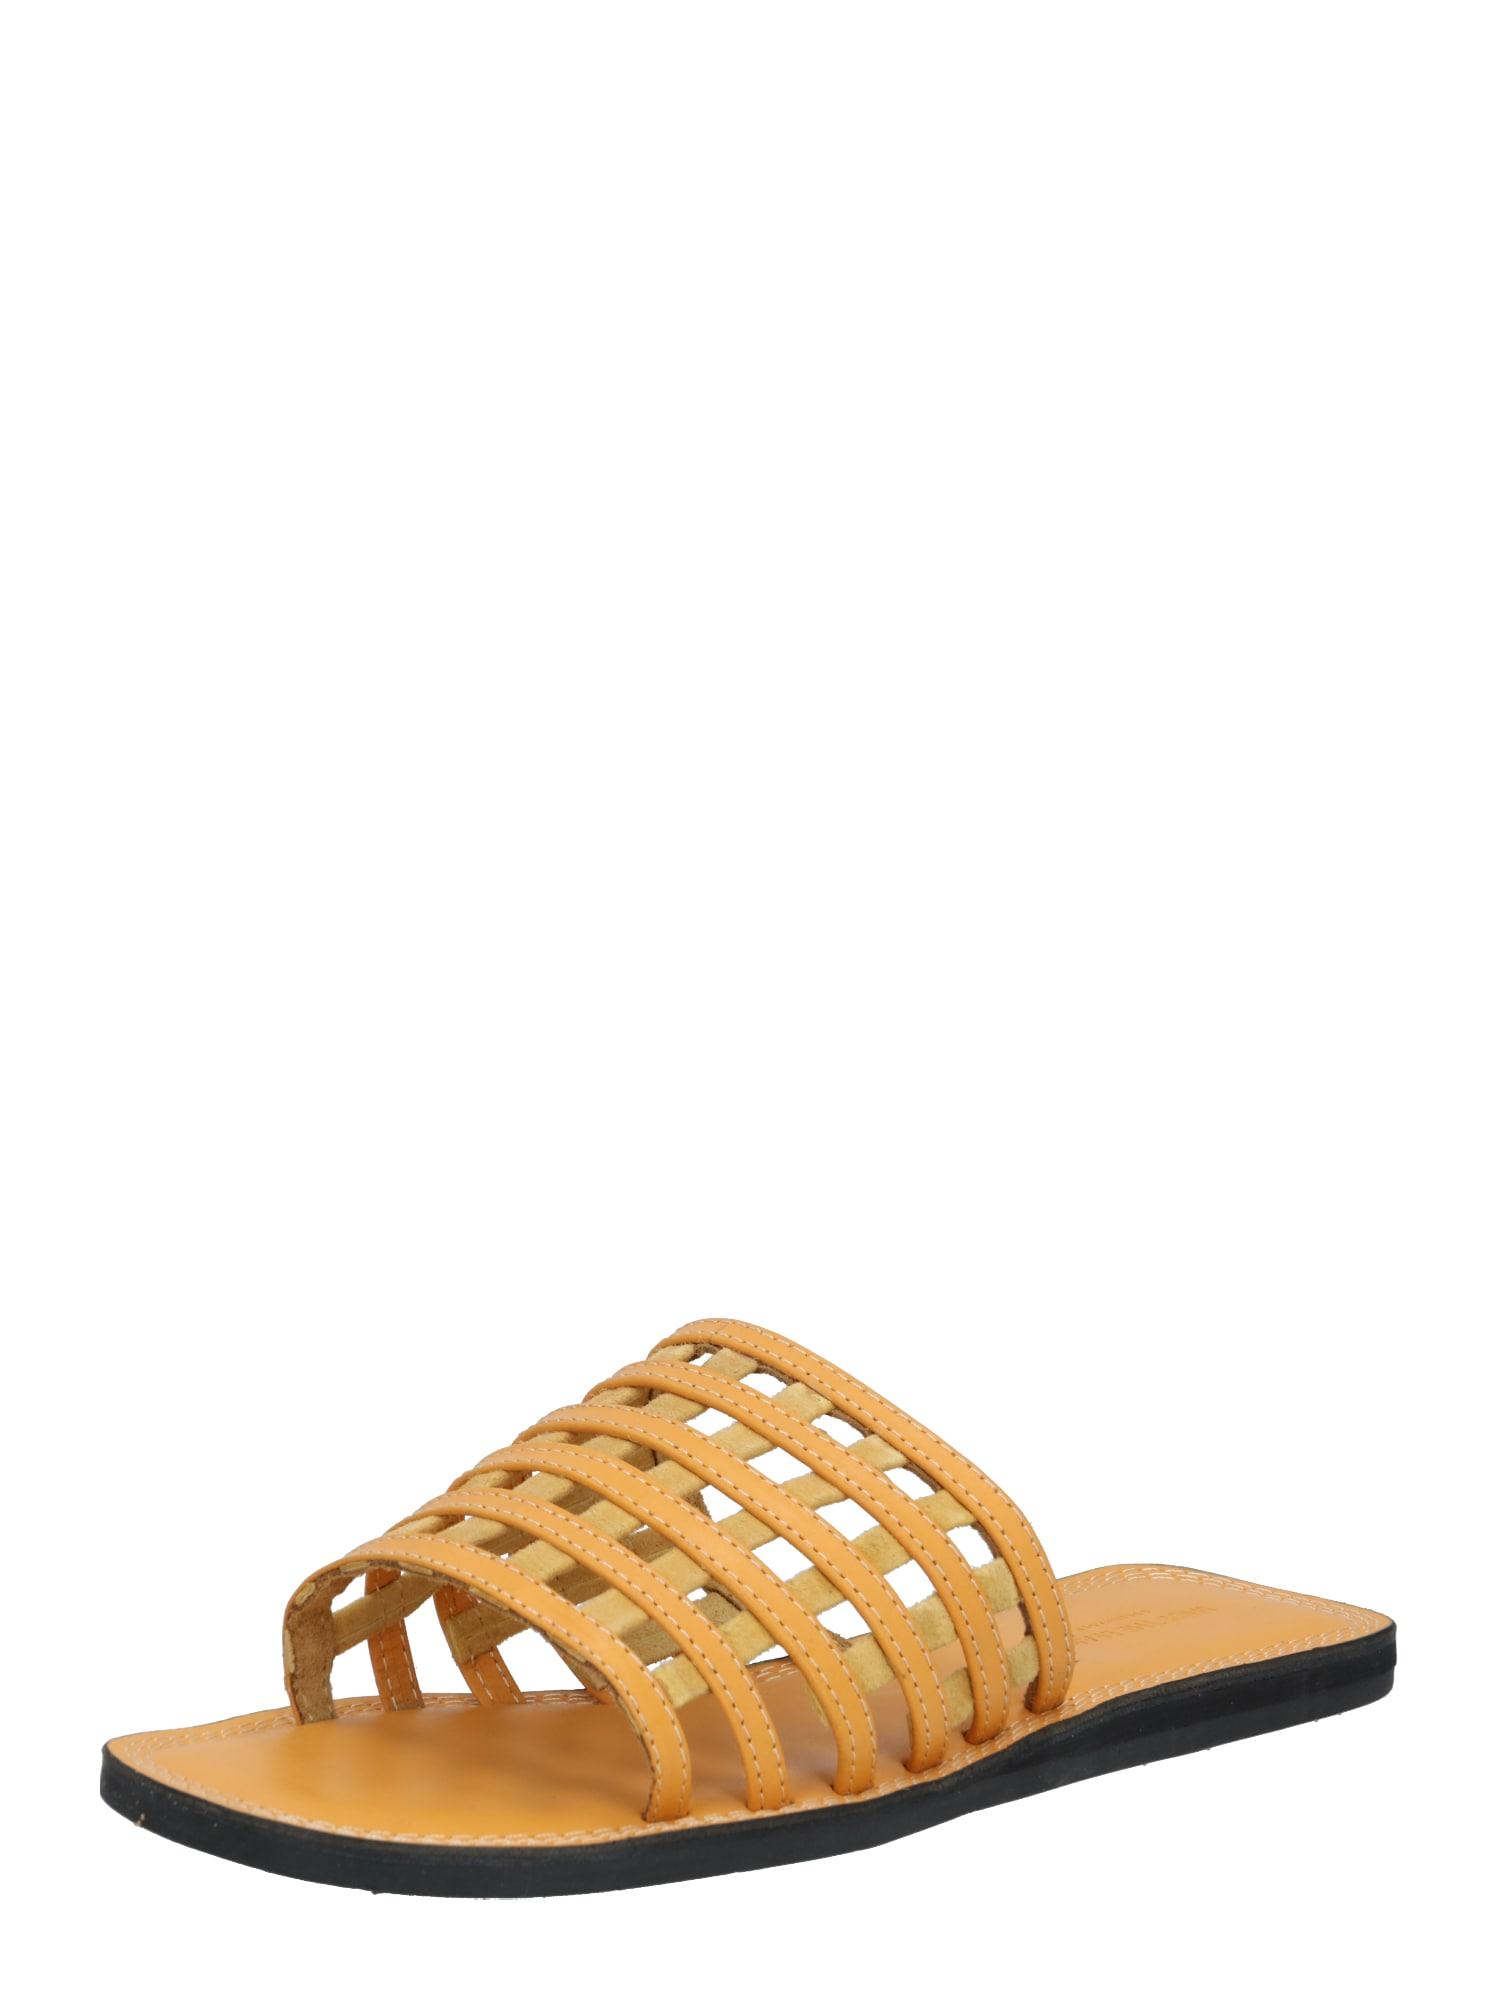 Shoe The Bear Saboți 'TAO CAGE'  galben